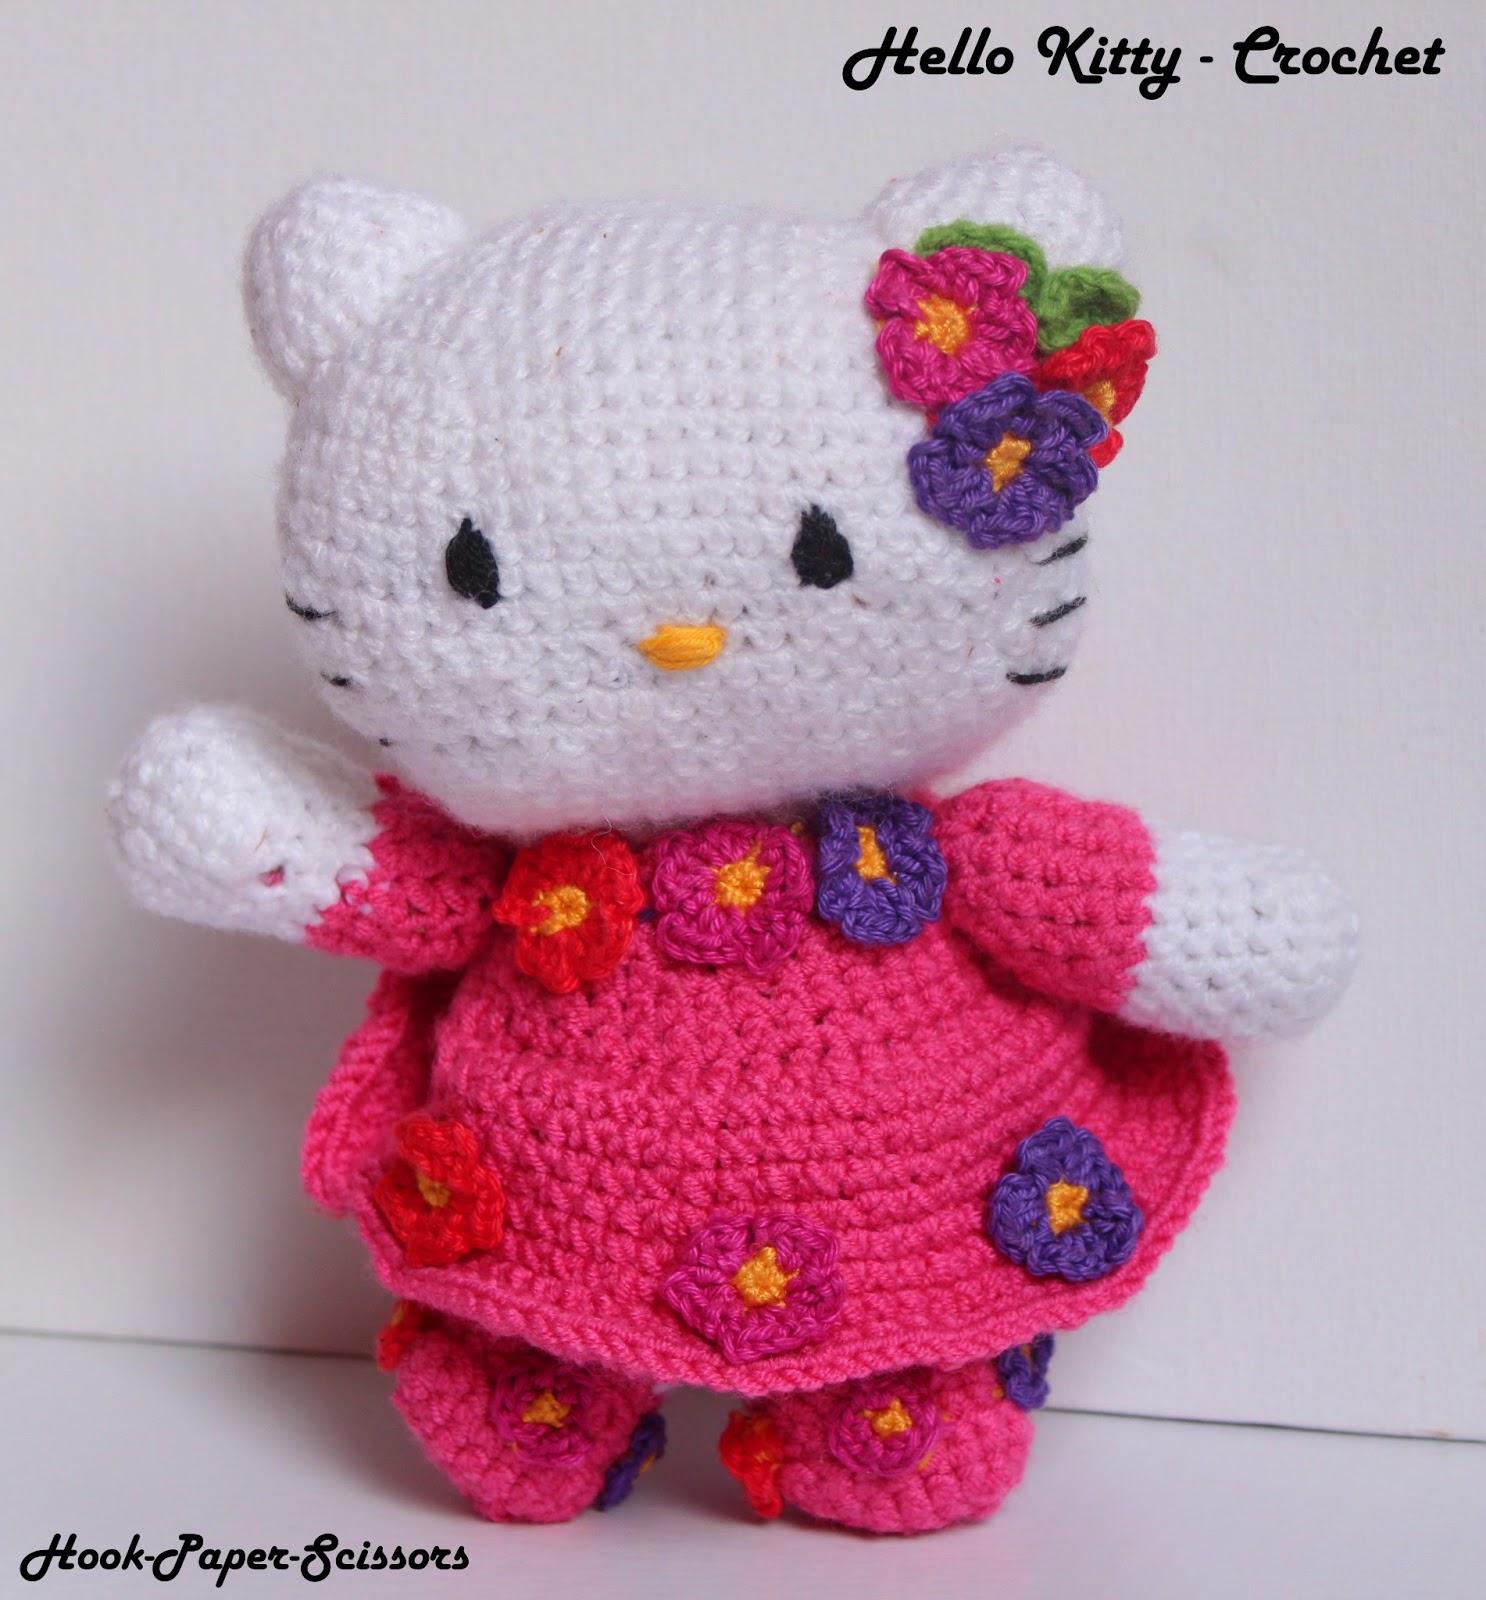 Hook-Paper-Scissors: Hello Kitty - Amigurumi